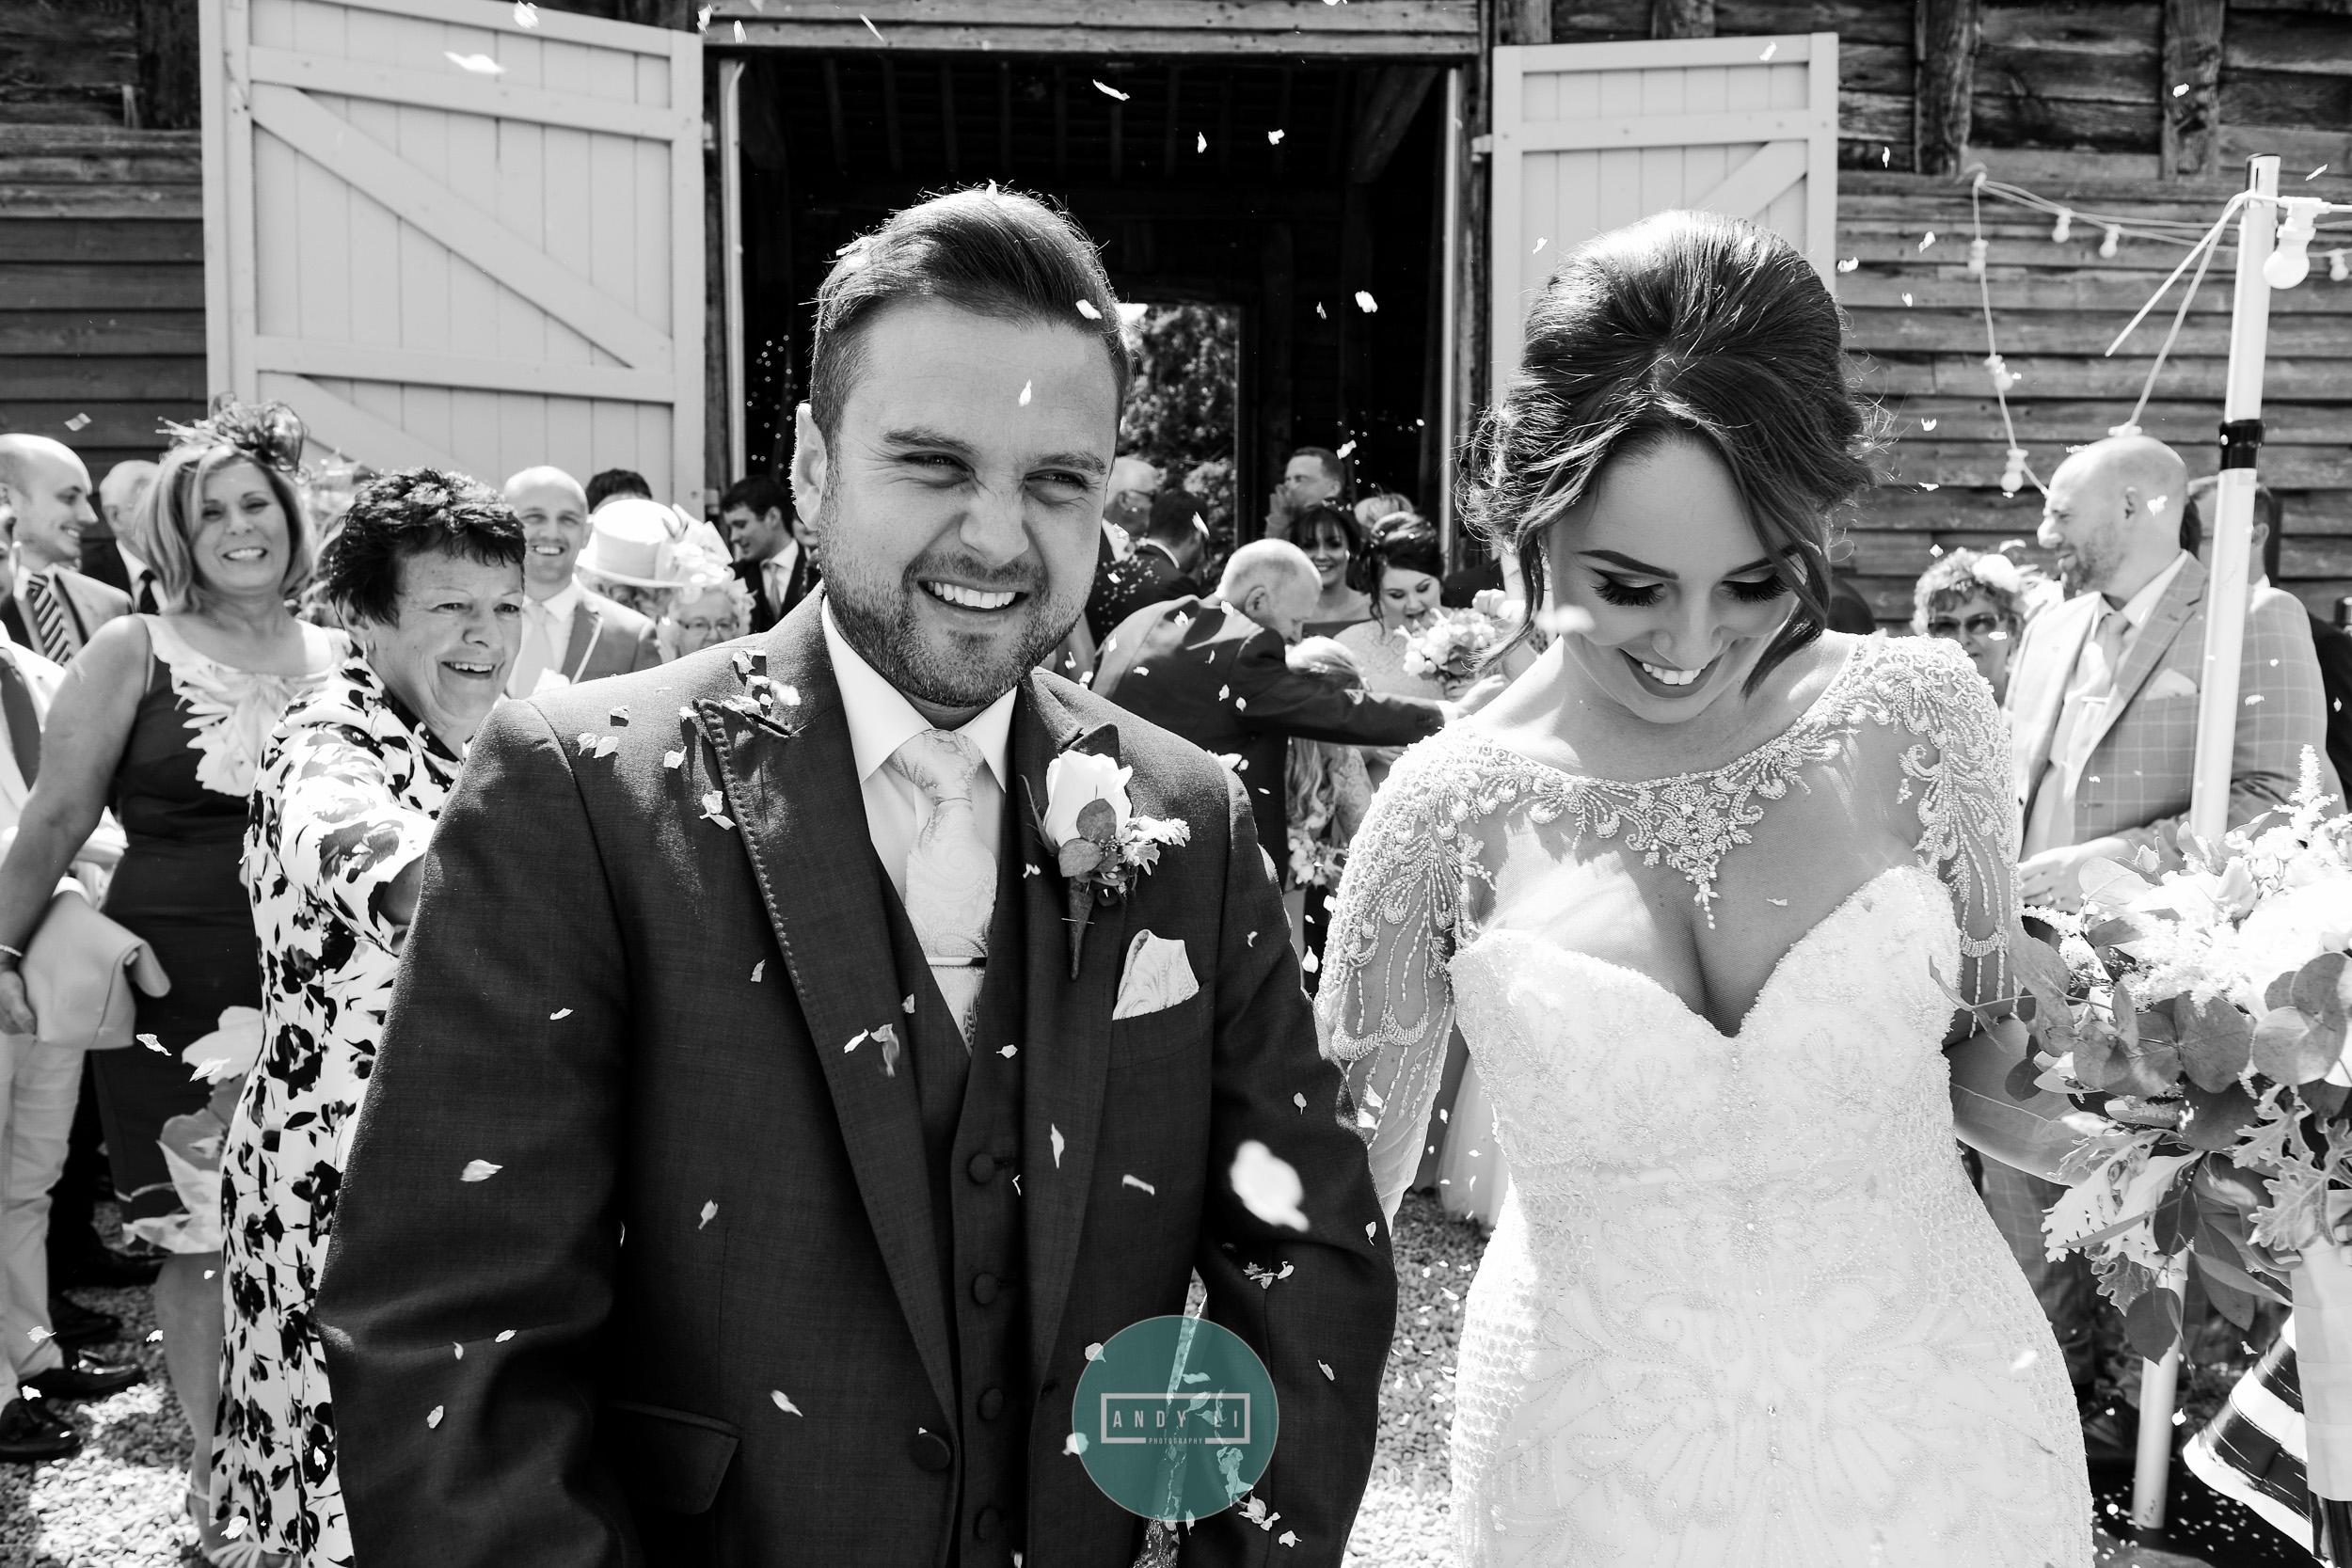 Pimhill Barn Wedding Photographer-070-XPRO6193.jpg